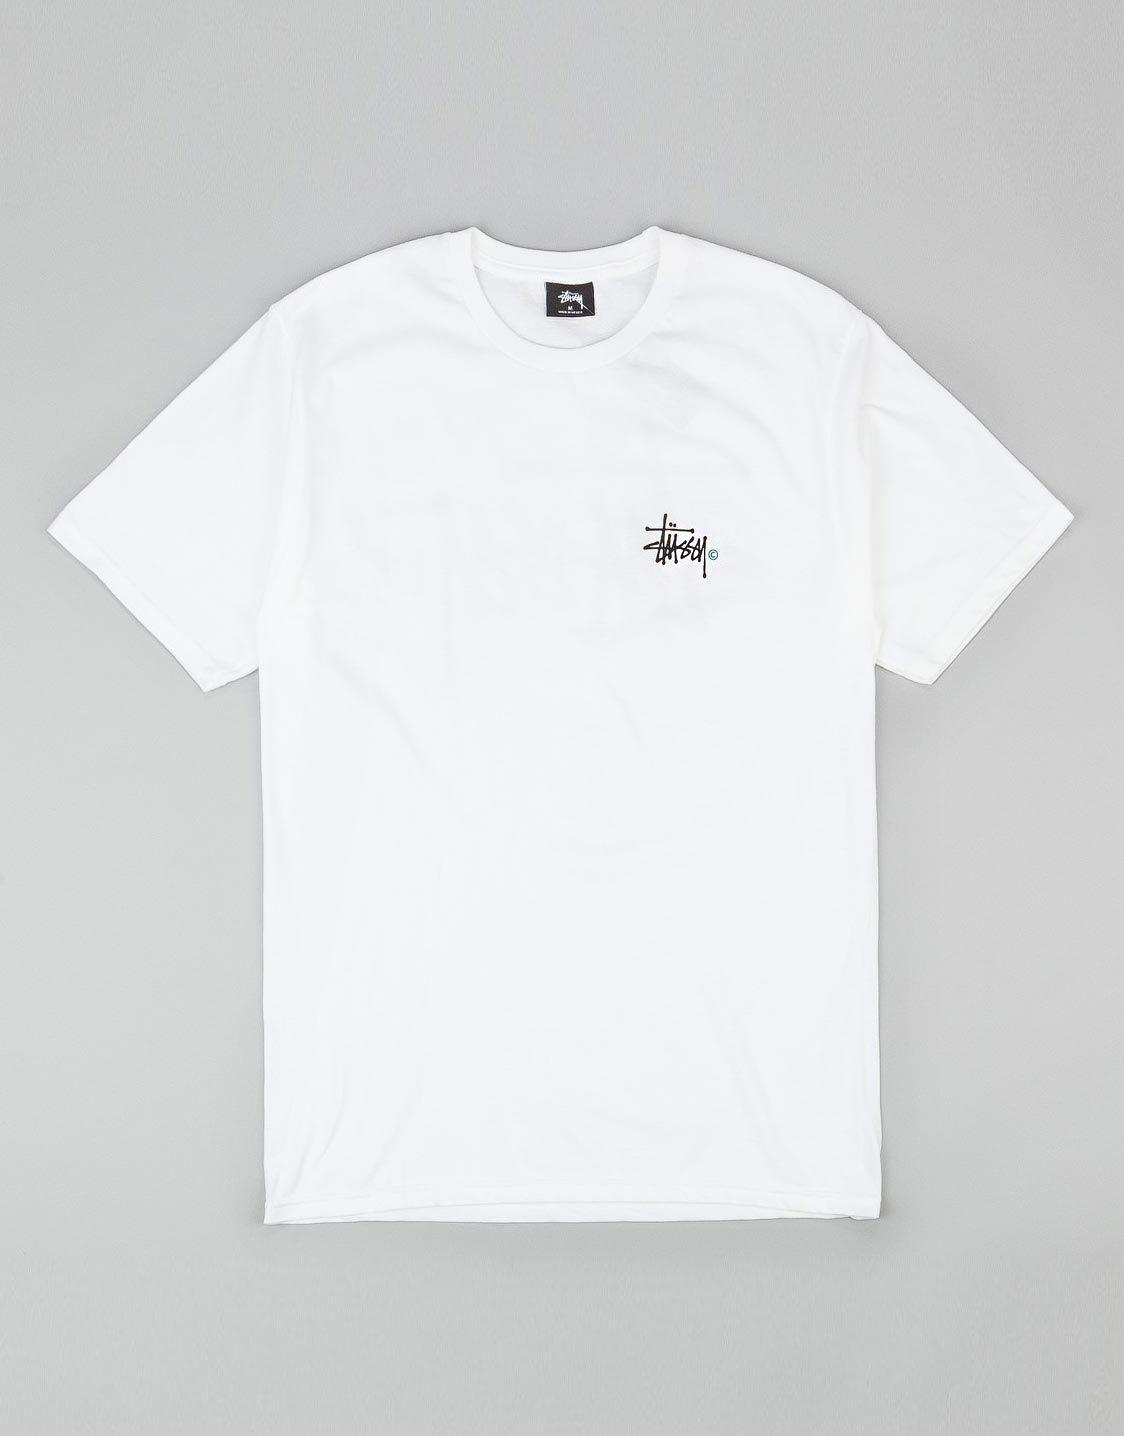 2a194caa Stussy Basic logo t-shirt white | Fashion // | Stussy, T shirt, Shirts